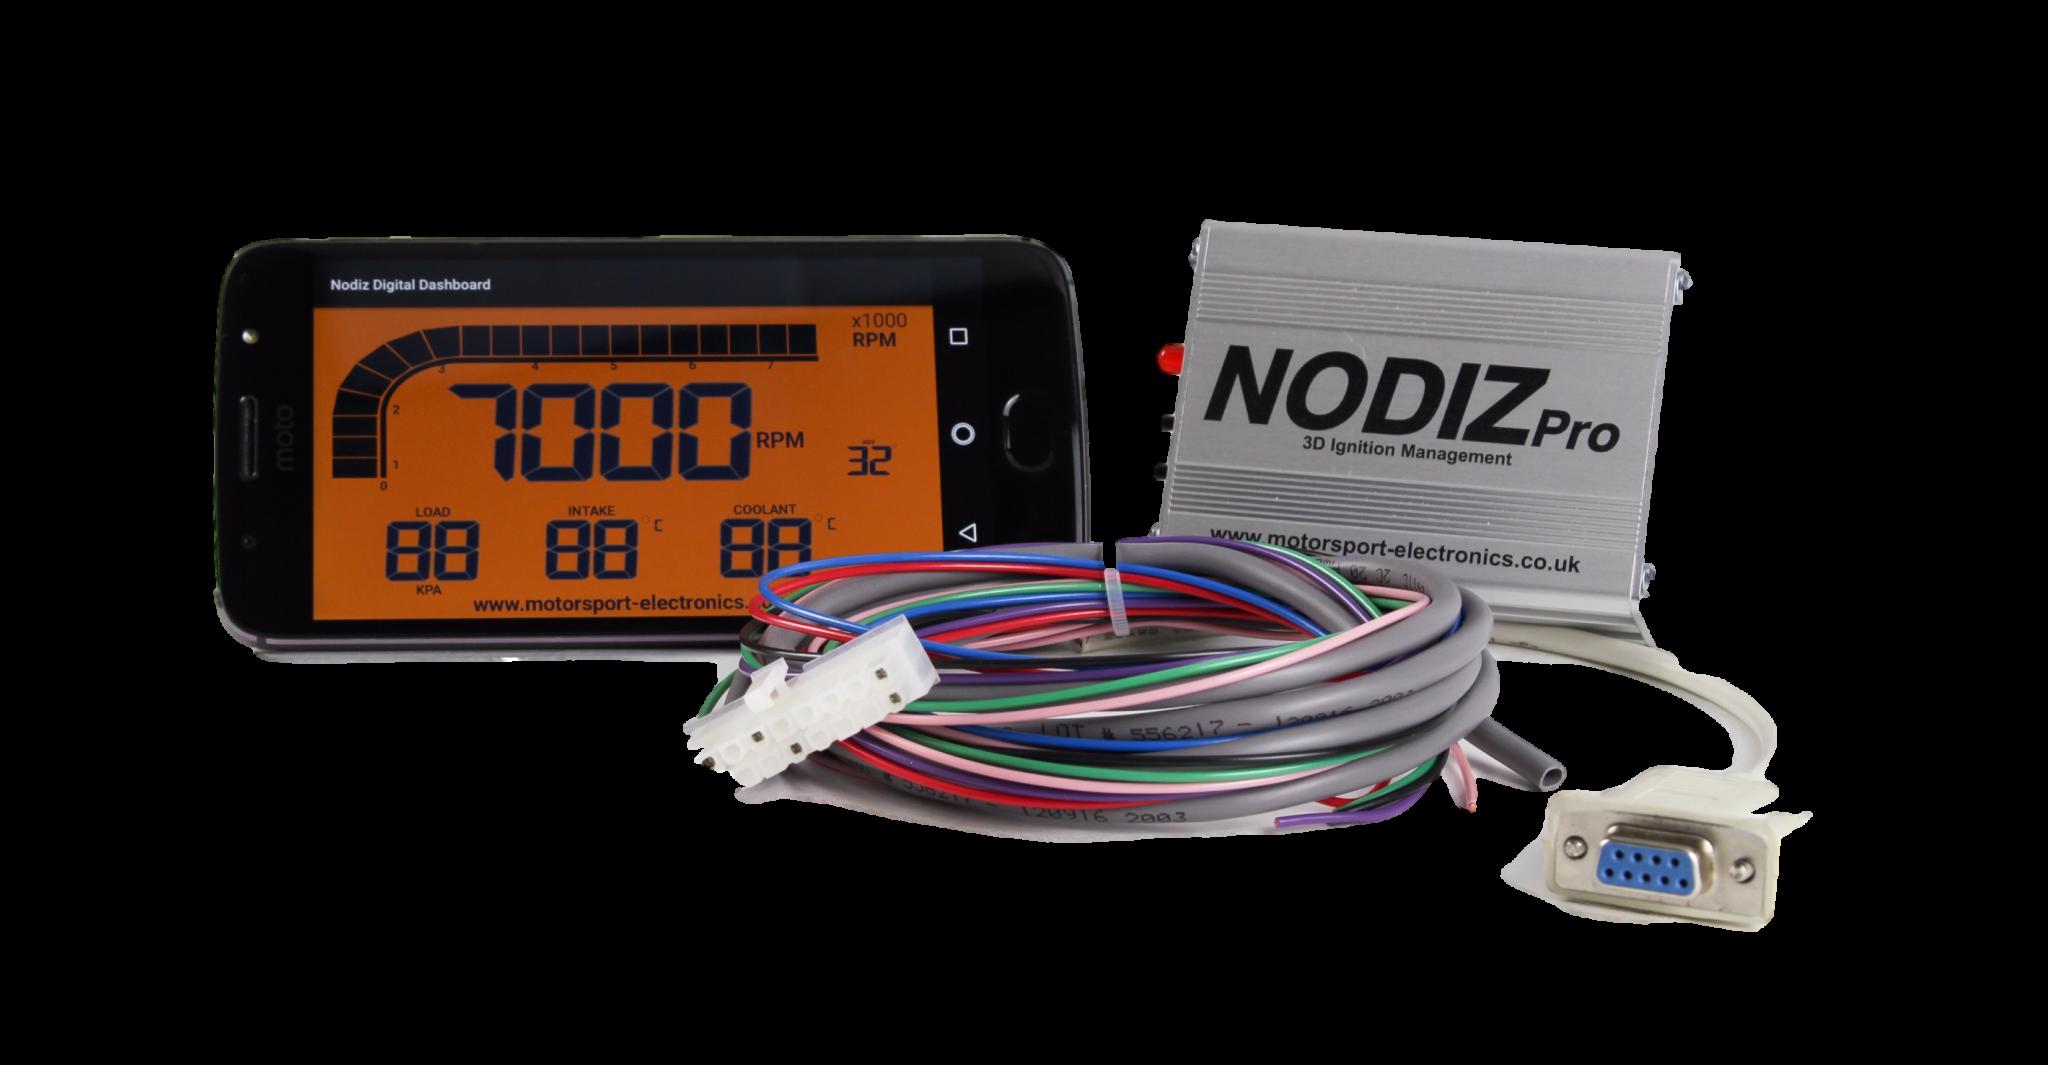 Nodiz Pro Peugeot 205 Kit Motorsport Electronics Electronic Circuit Kits For Adults Uk